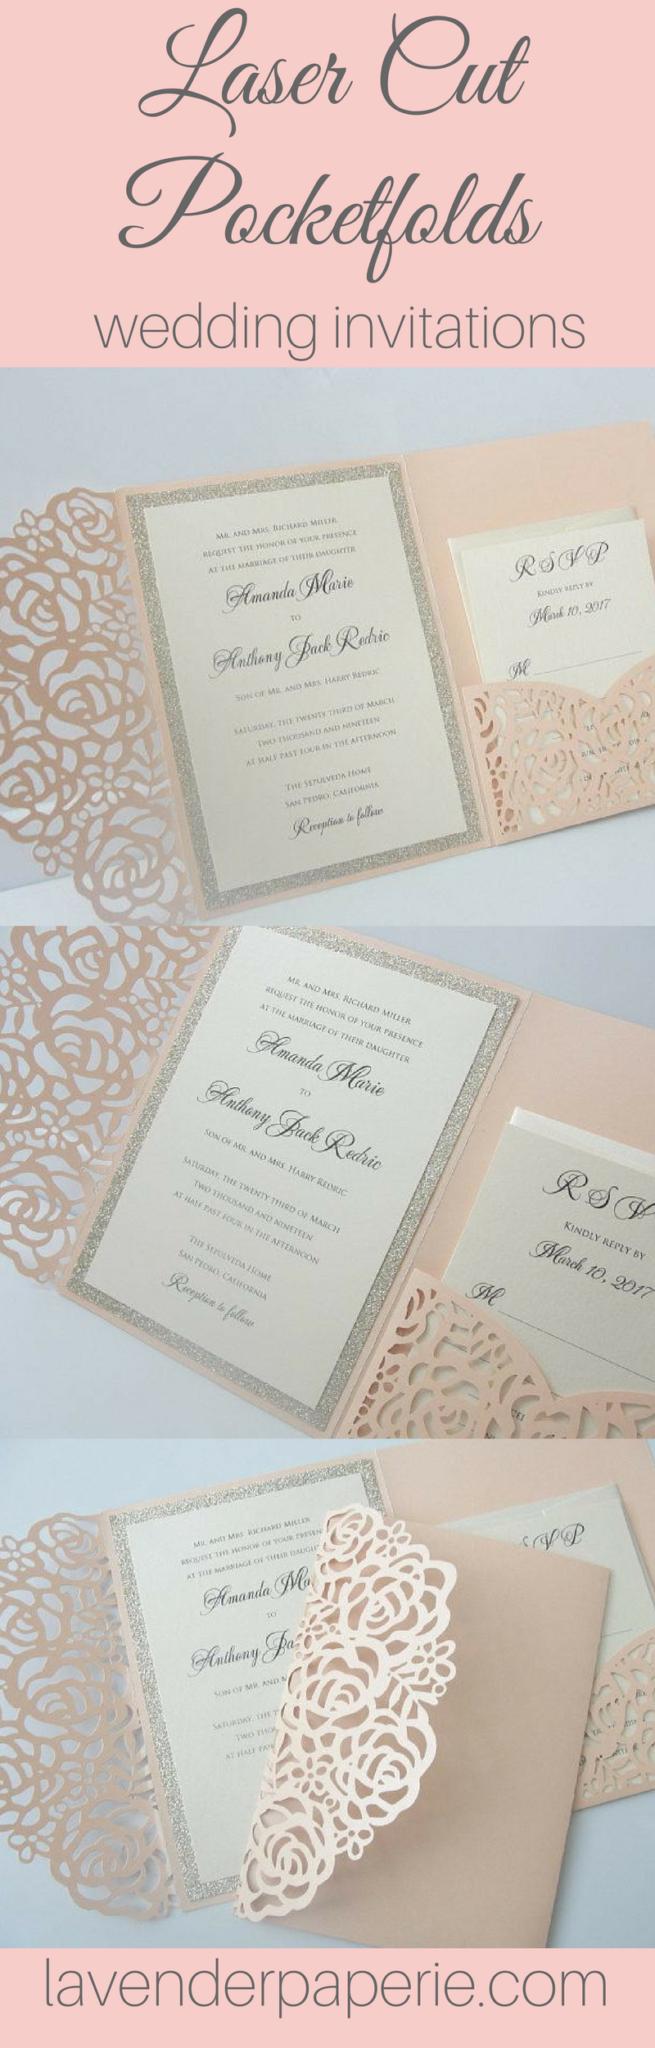 SHAY 8.00 Wedding invitations romantic, Acrylic